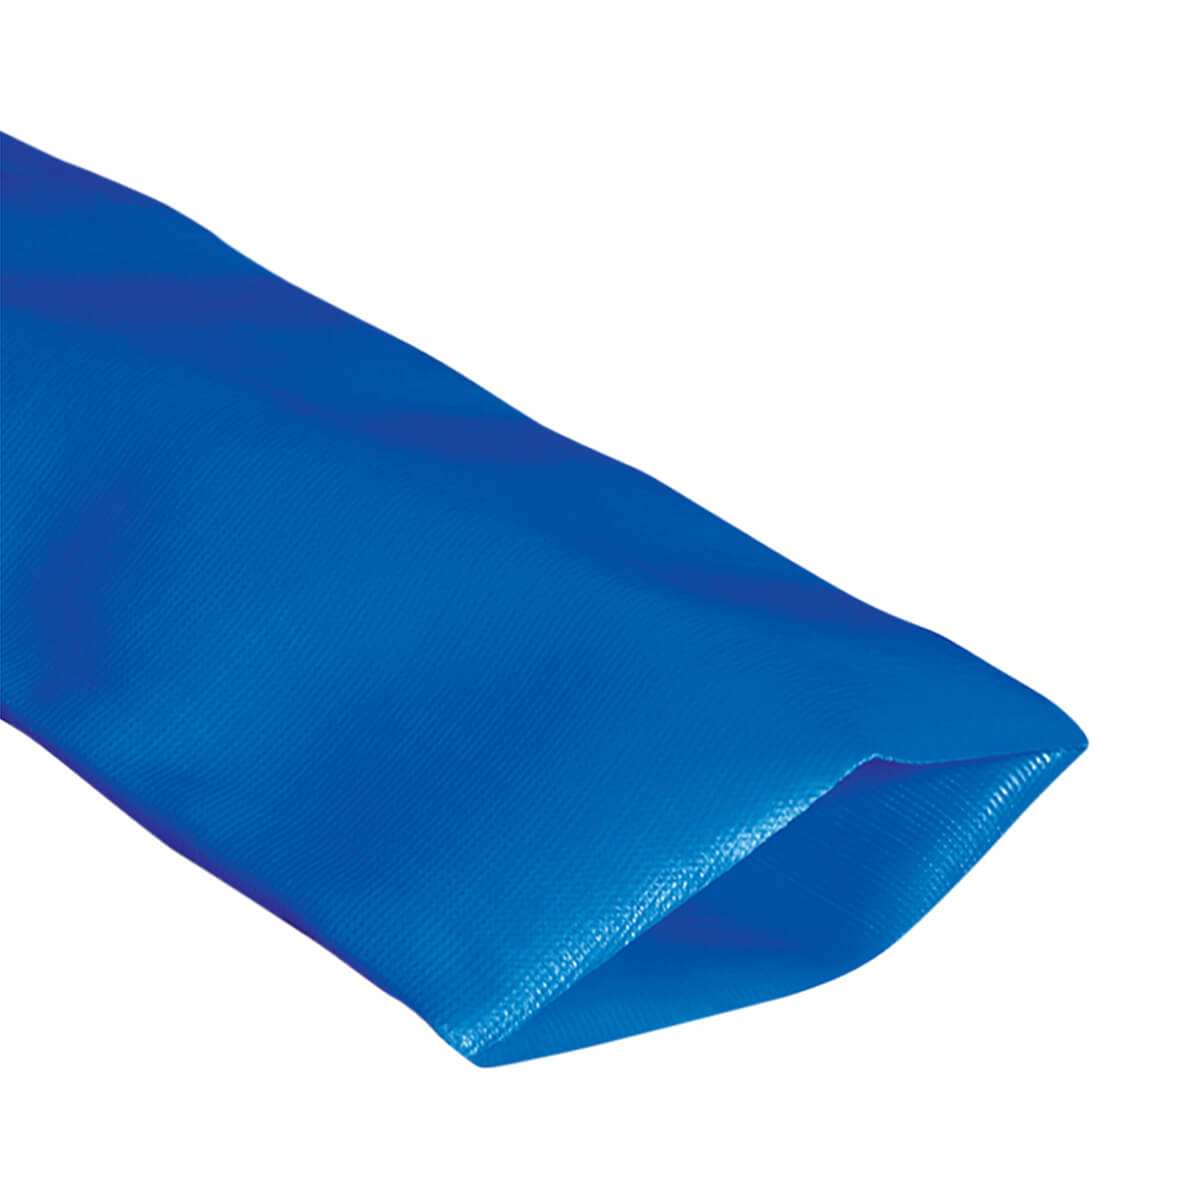 "Blue Standard-Duty PVC Layflat Discharge Hose - 1-1/2"" - Price Per Foot"